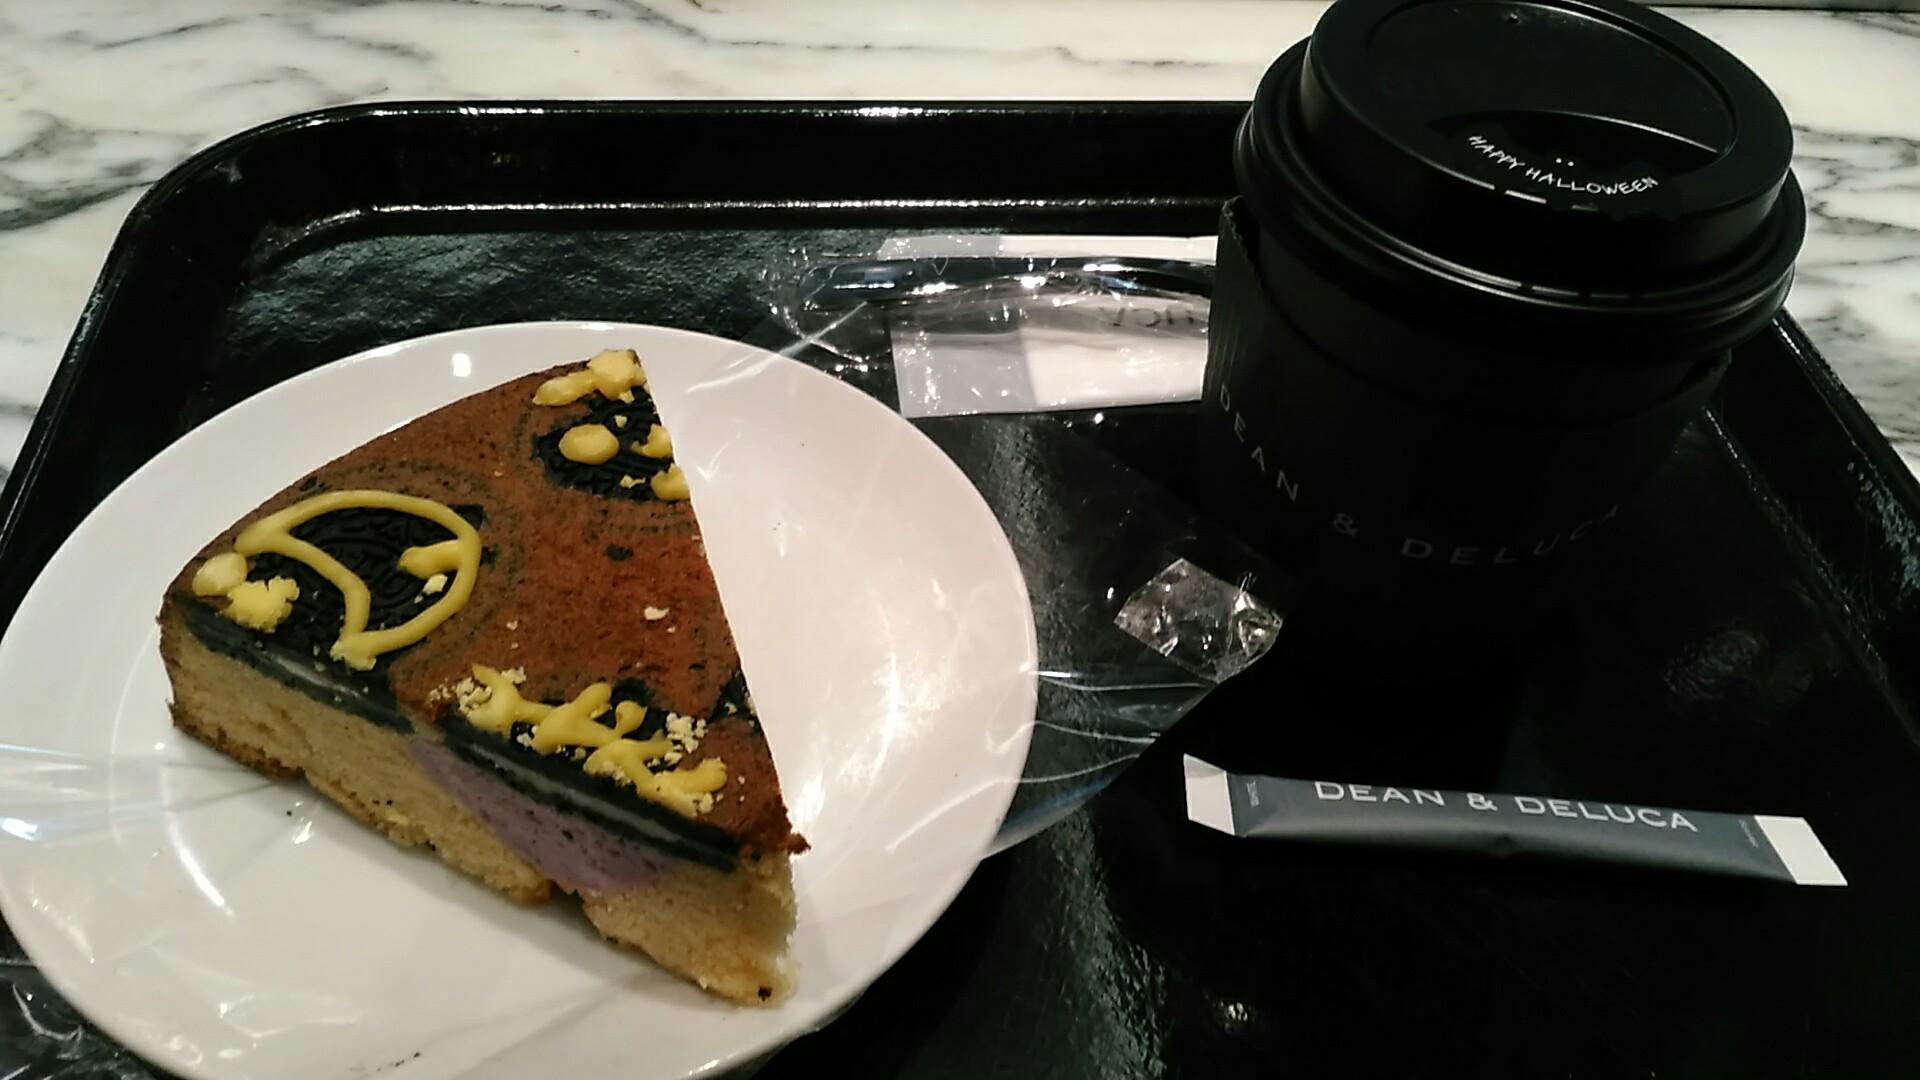 DEAN & DELUCA CAFE(ディーン&デルーカ カフェ NEWoMan) 『キャラメルジャック』_a0326295_22305147.jpg